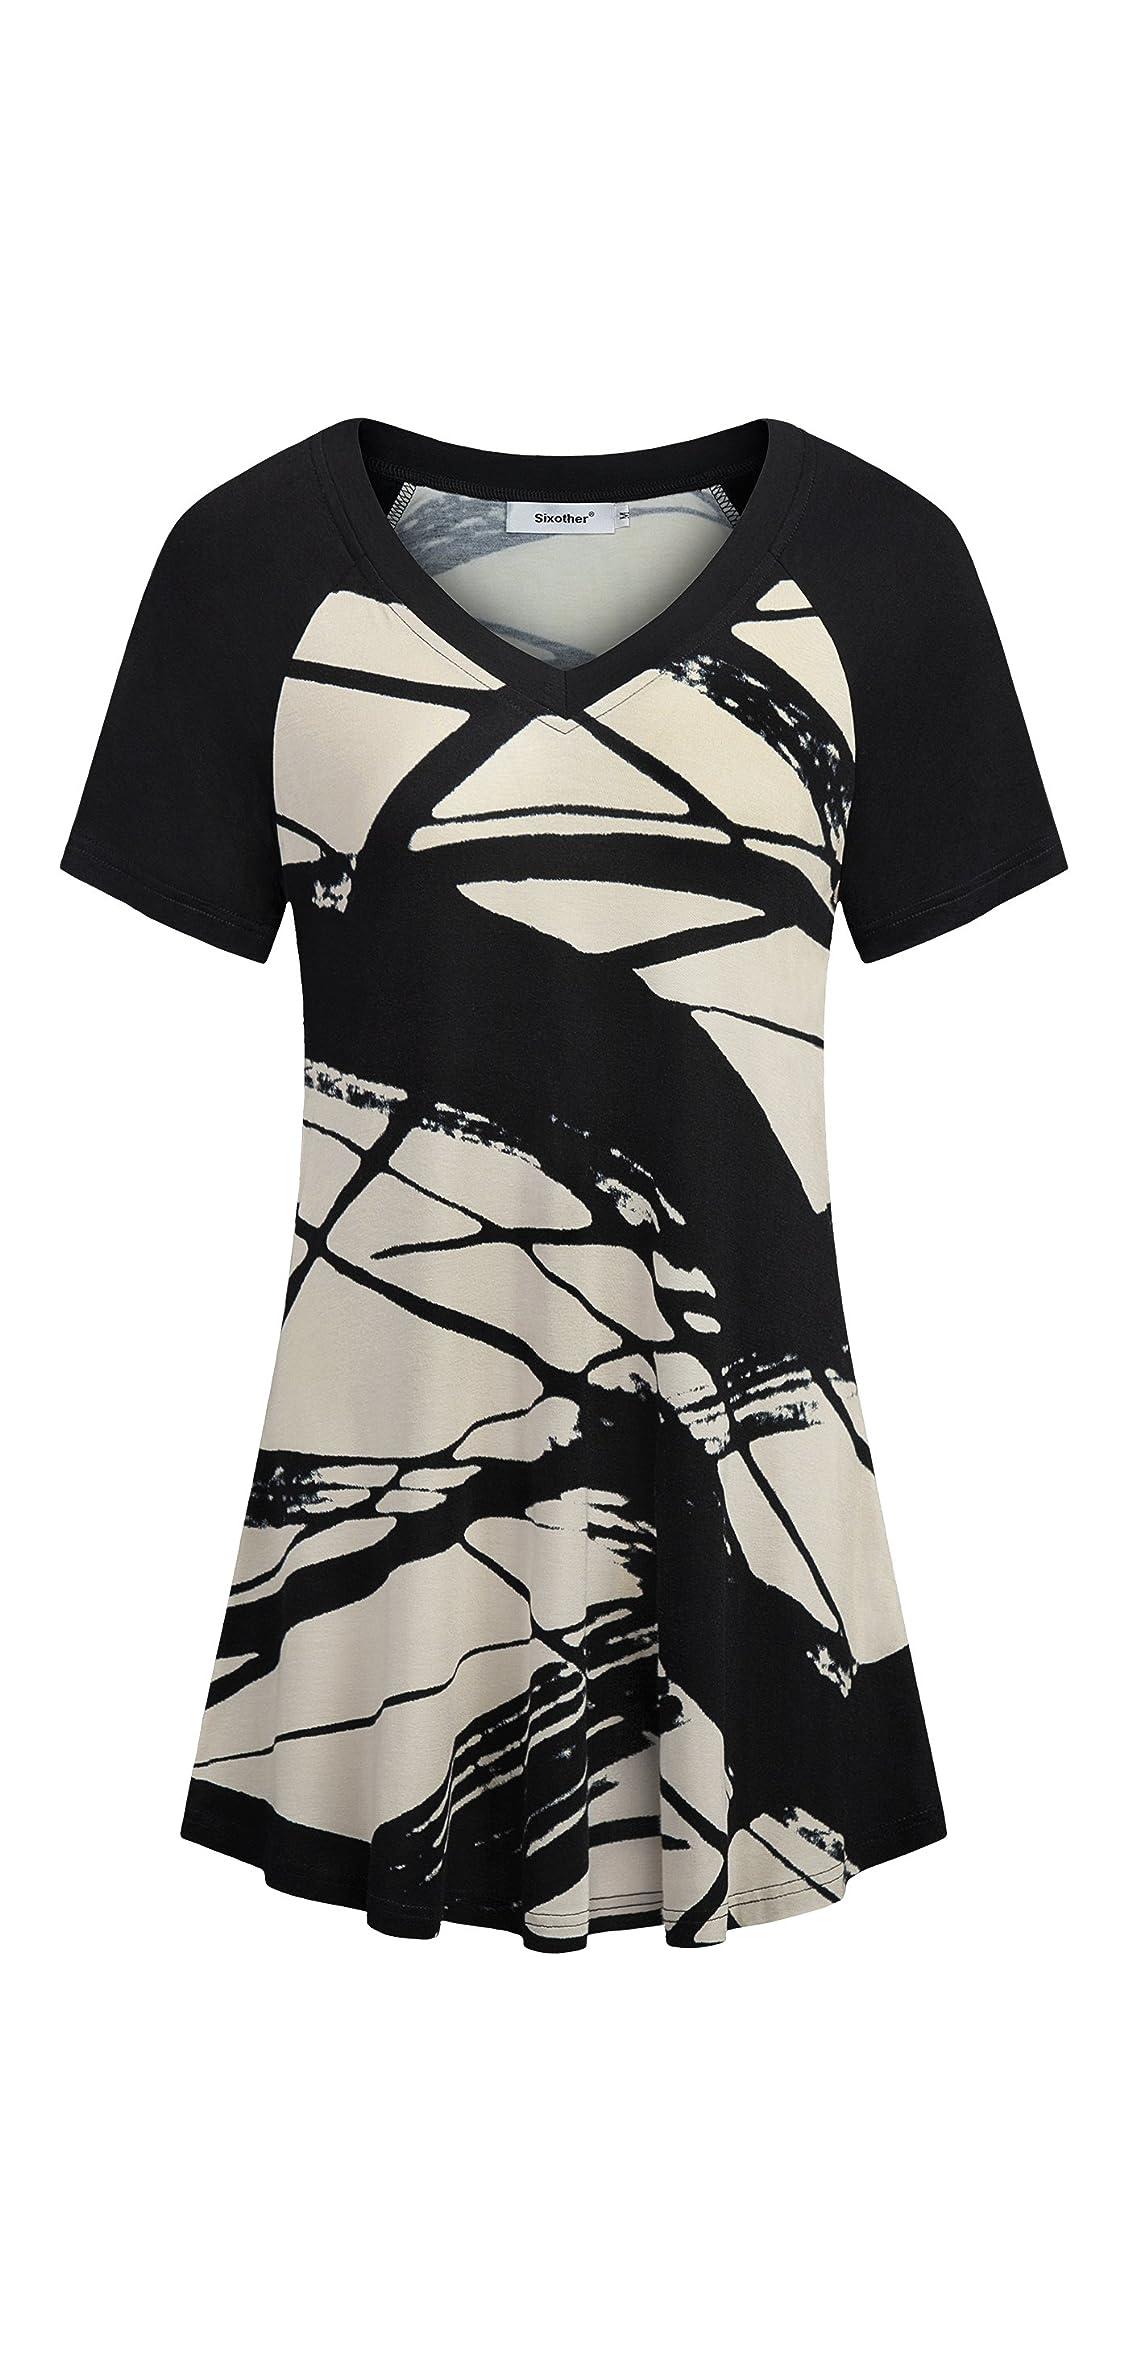 Womens Floral Printing Tunics Short Sleeves Tops V Neck